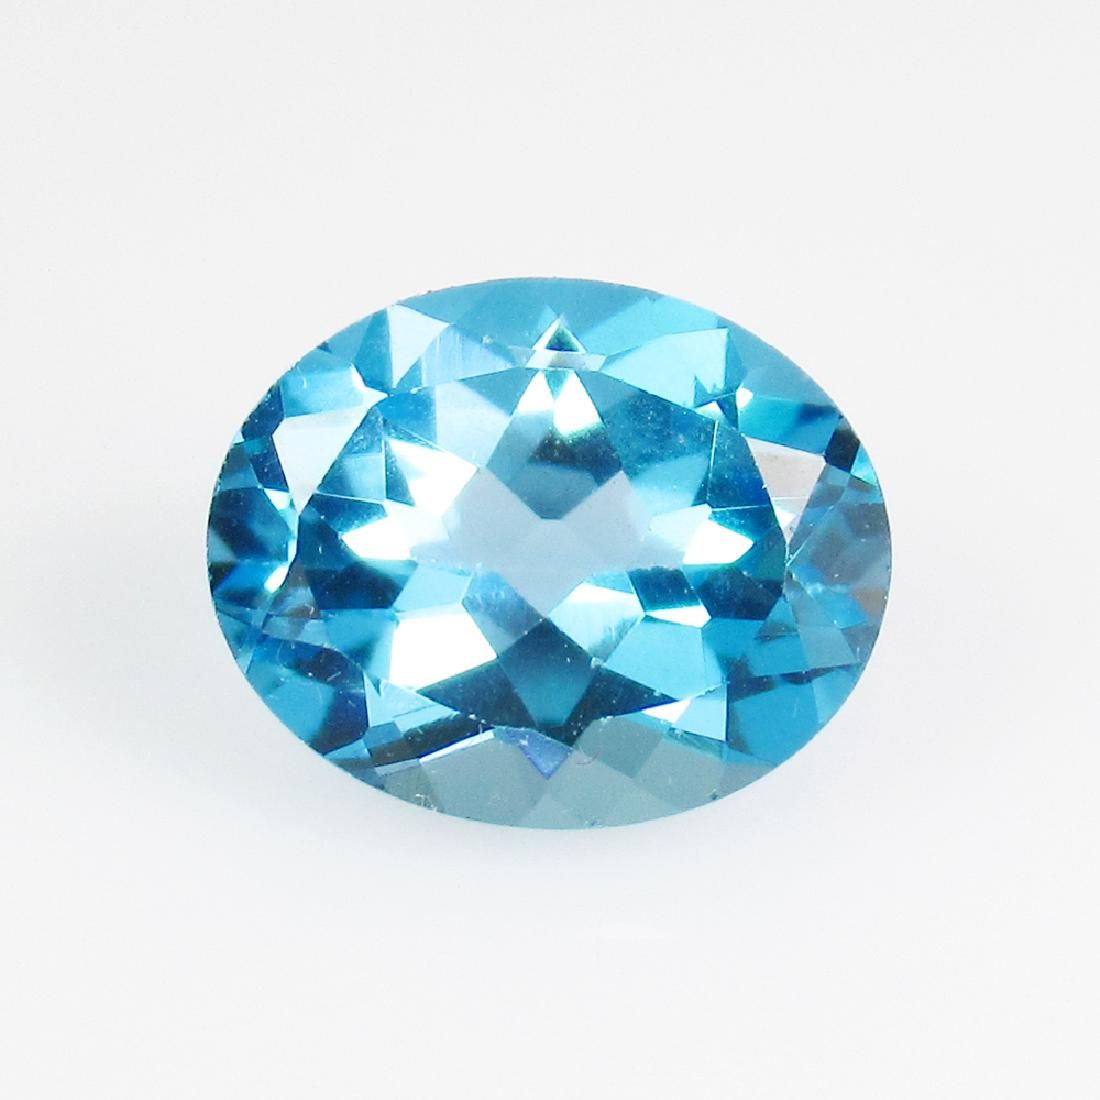 2.64 Ct Genuine Blue Topaz 10X8 mm Oval Cut